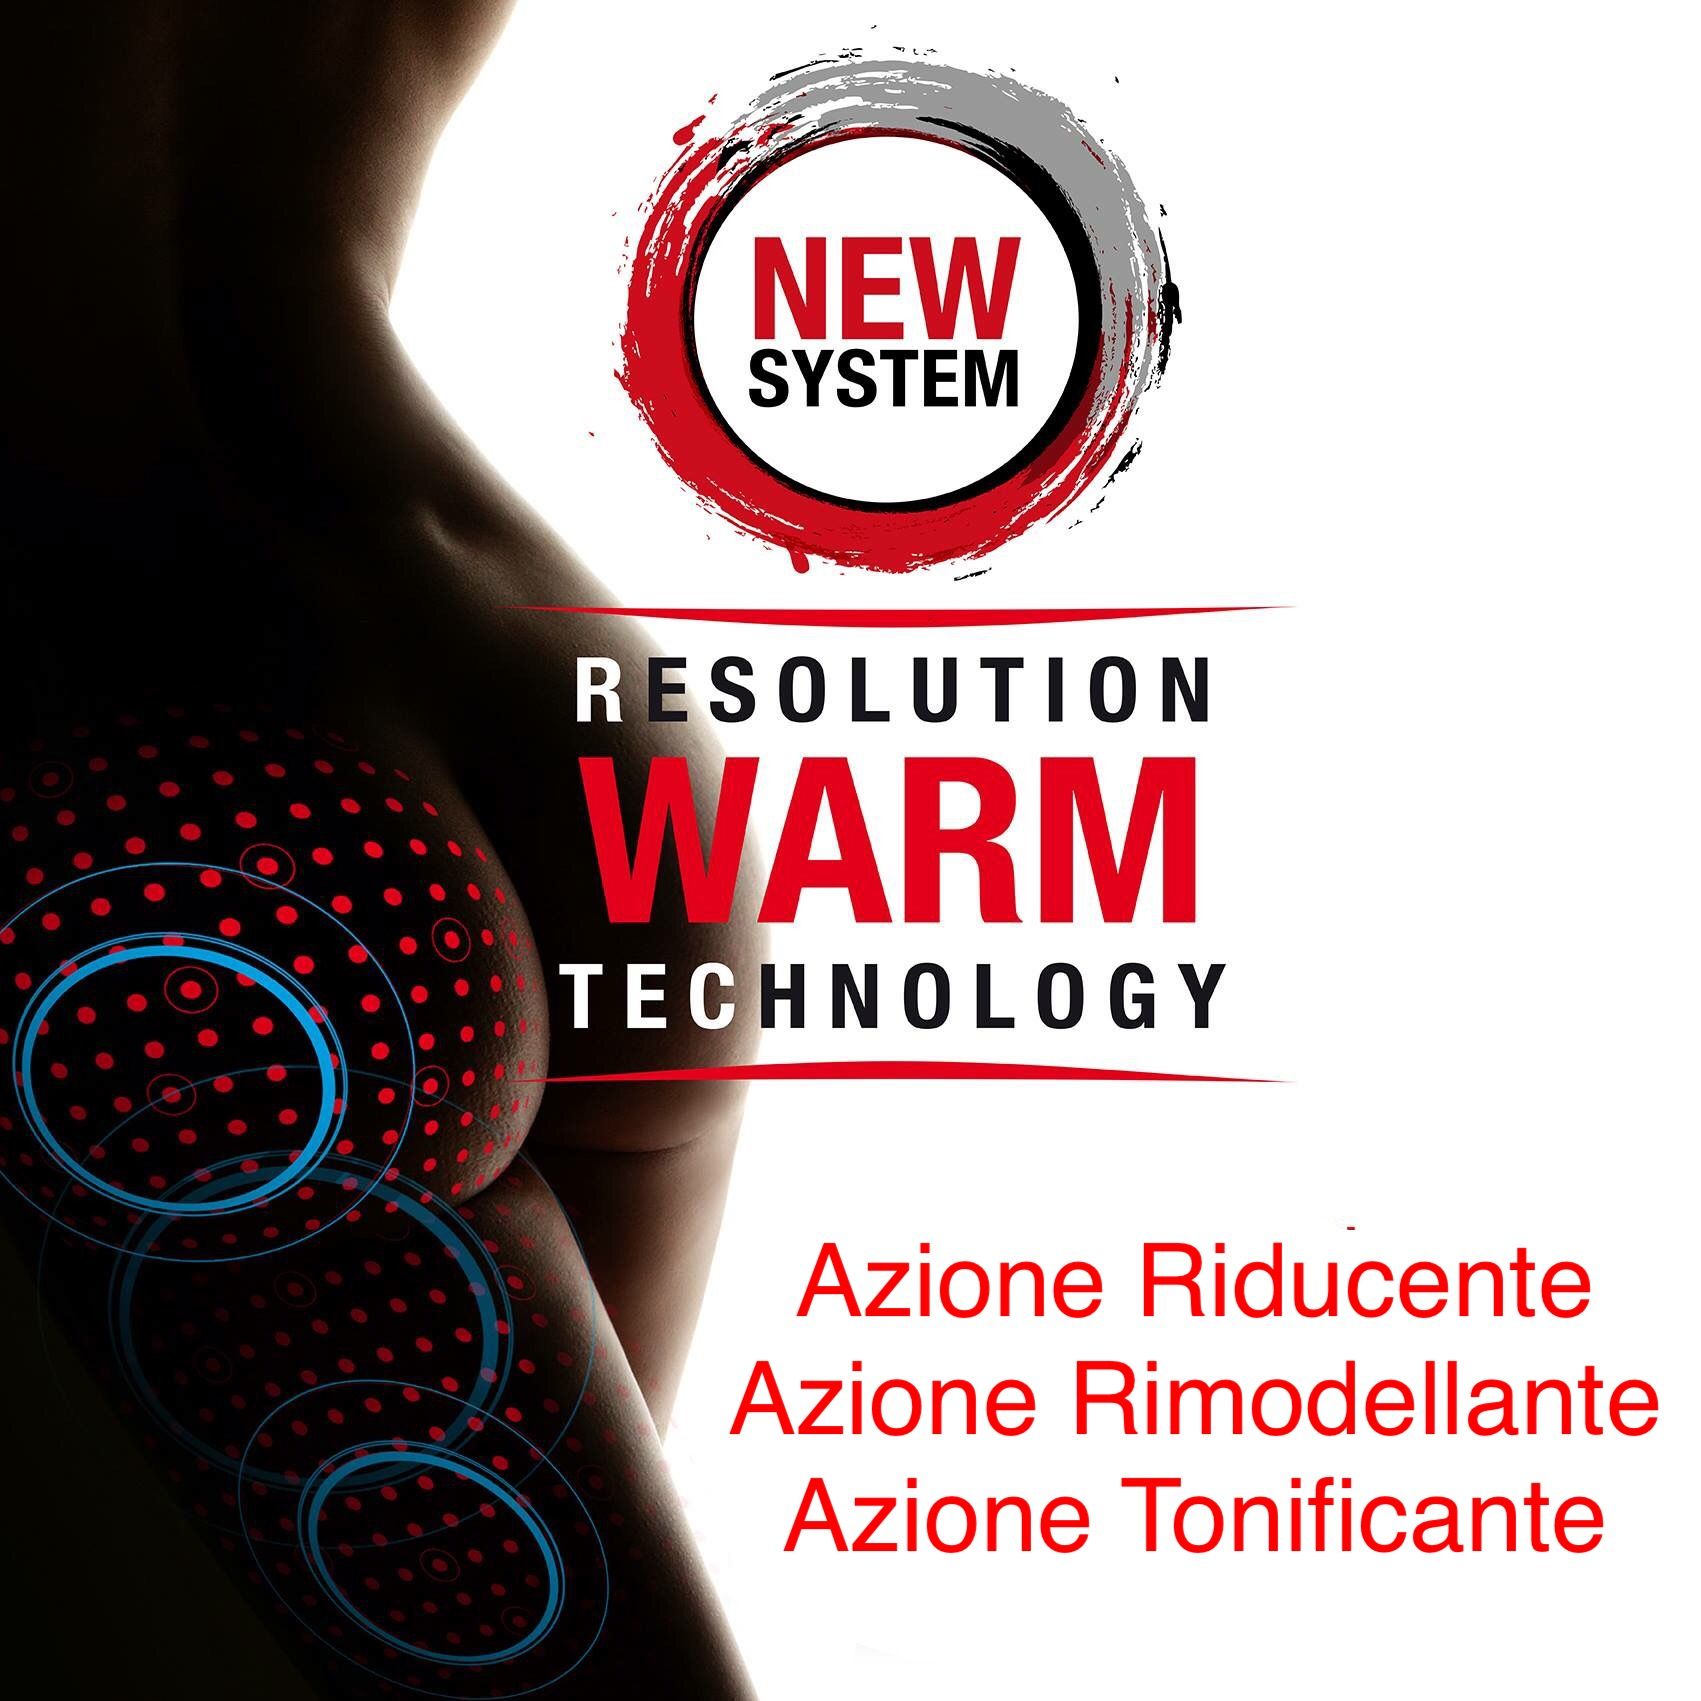 resolution warm technology